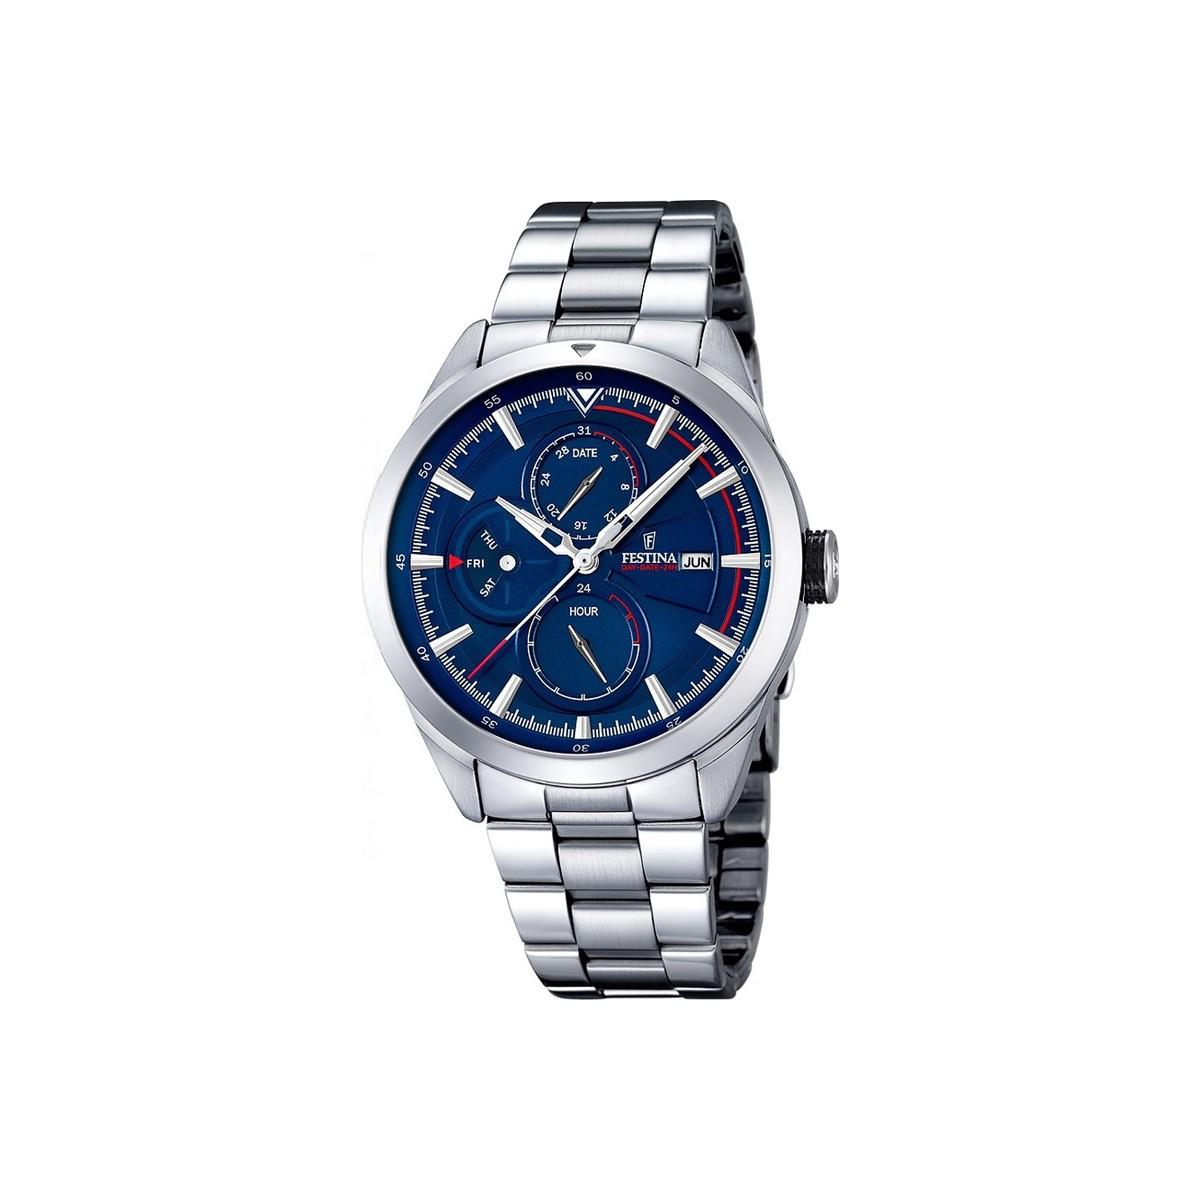 https://www.gaberjoyeria.com/3333-thickbox_default/reloj-festina-f16828-2.jpg